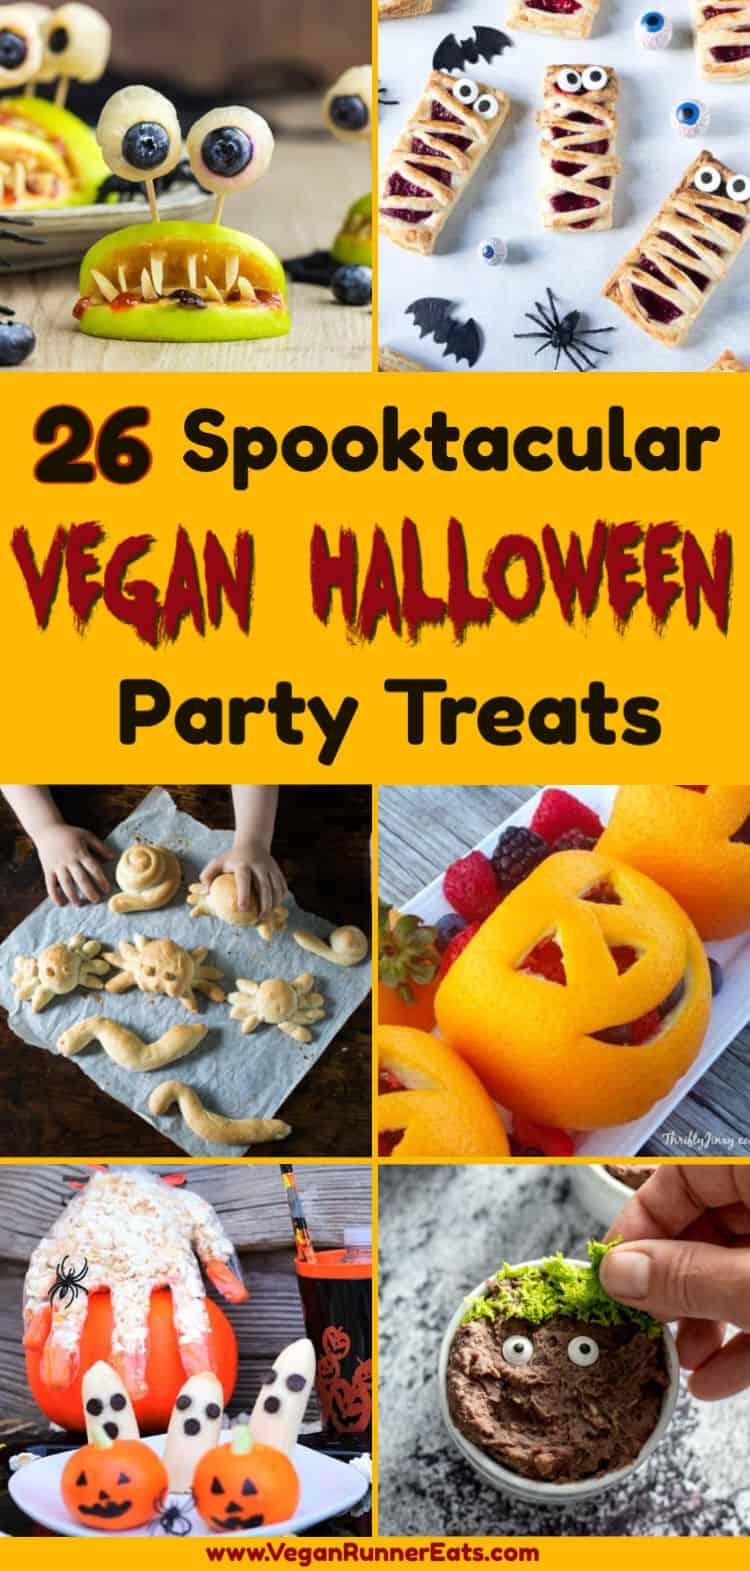 26 Spooktacular Vegan Halloween Recipes Vegan Appetizers Main Course And Sweet Treats Fo Vegan Halloween Food Halloween Food For Party Vegan Halloween Treat